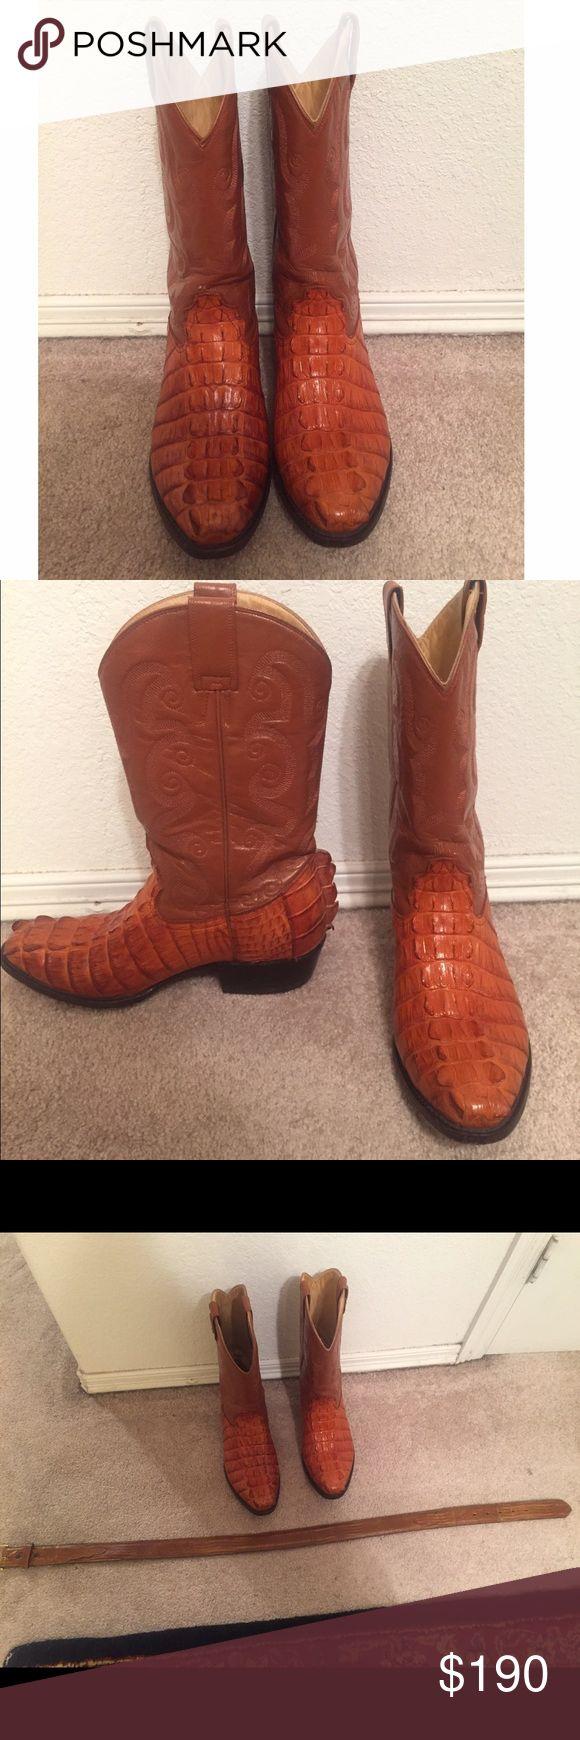 Men's Alligator Boots w/ matching belt Alligator men's boots w/ matching belt. Burnt Orange color. Very good condition. Pecos Bill Shoes Boots